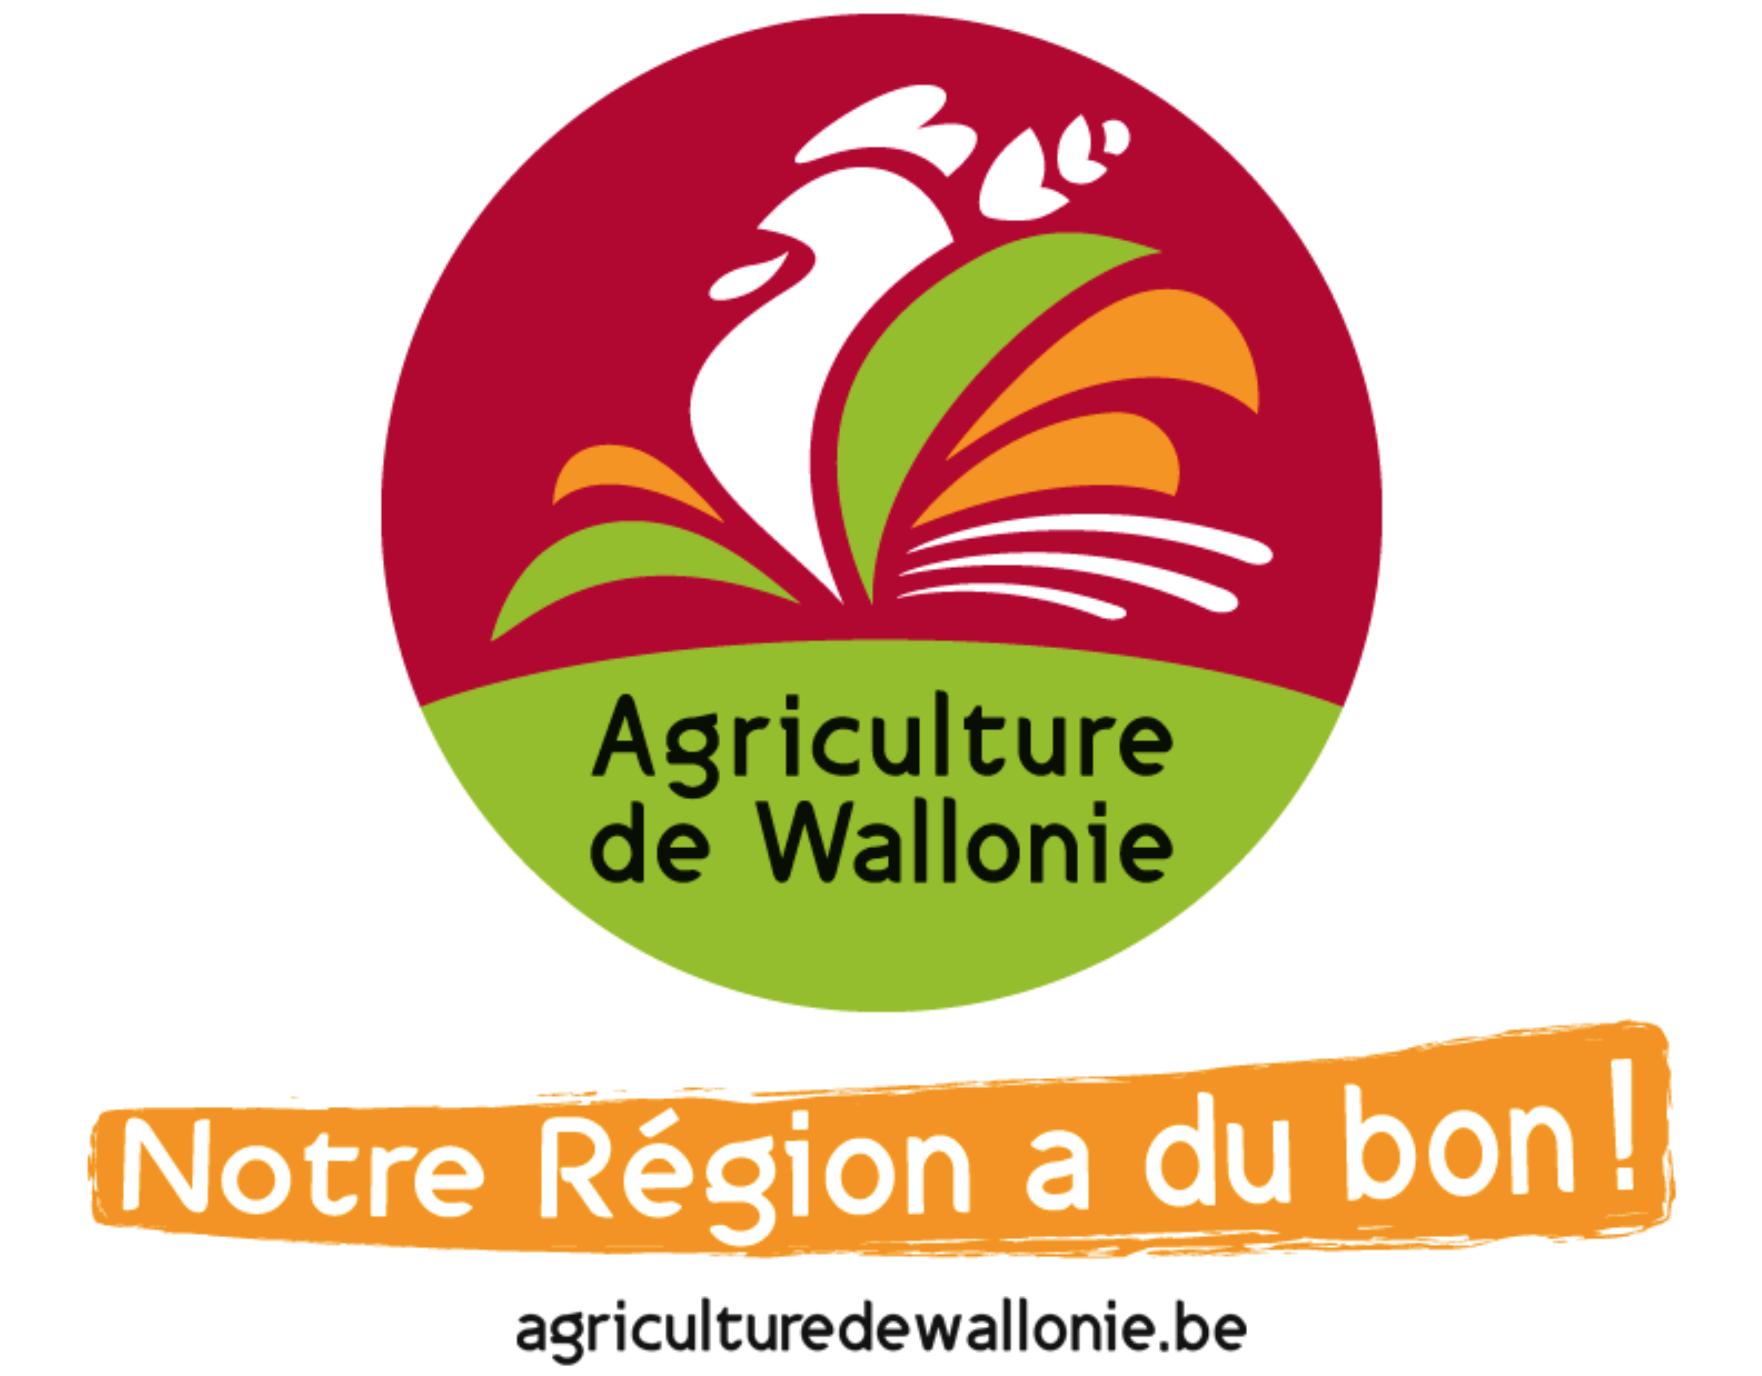 agriculture-de-wallonie-logo